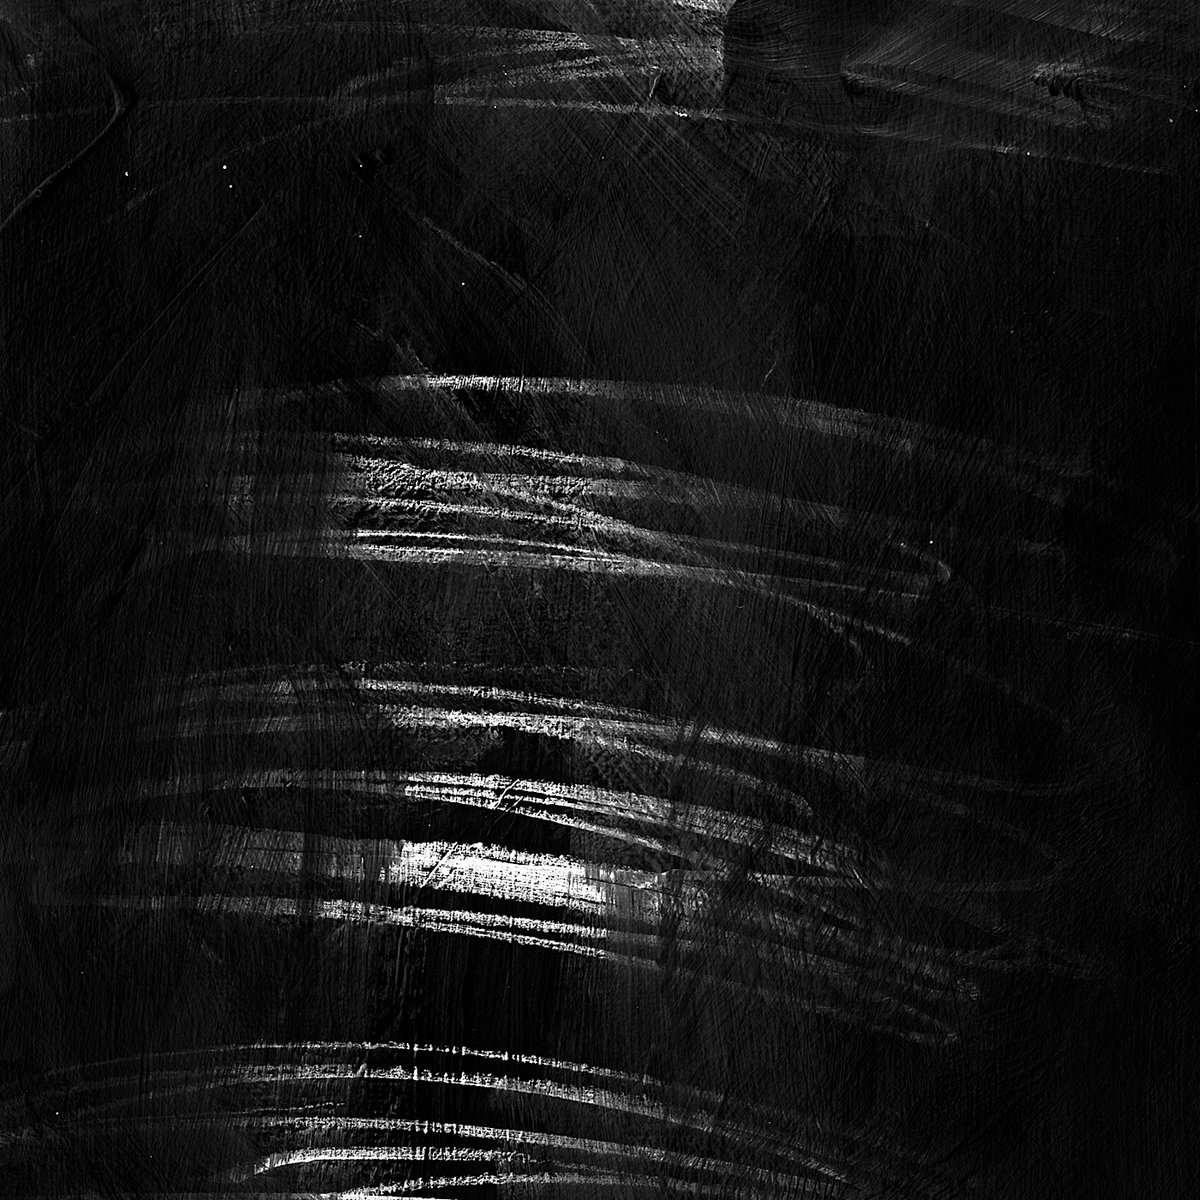 Current catalogue / listen to the lot... >> https://svrsound.bandcamp.com/   #electronicmusic #experimentalmusic #minimal #drone #ambient #darkambient #sunrise #sunset #soundtrack #newmusic #freemusic #bandcamp #downloadpic.twitter.com/F4i3ZWcVZi